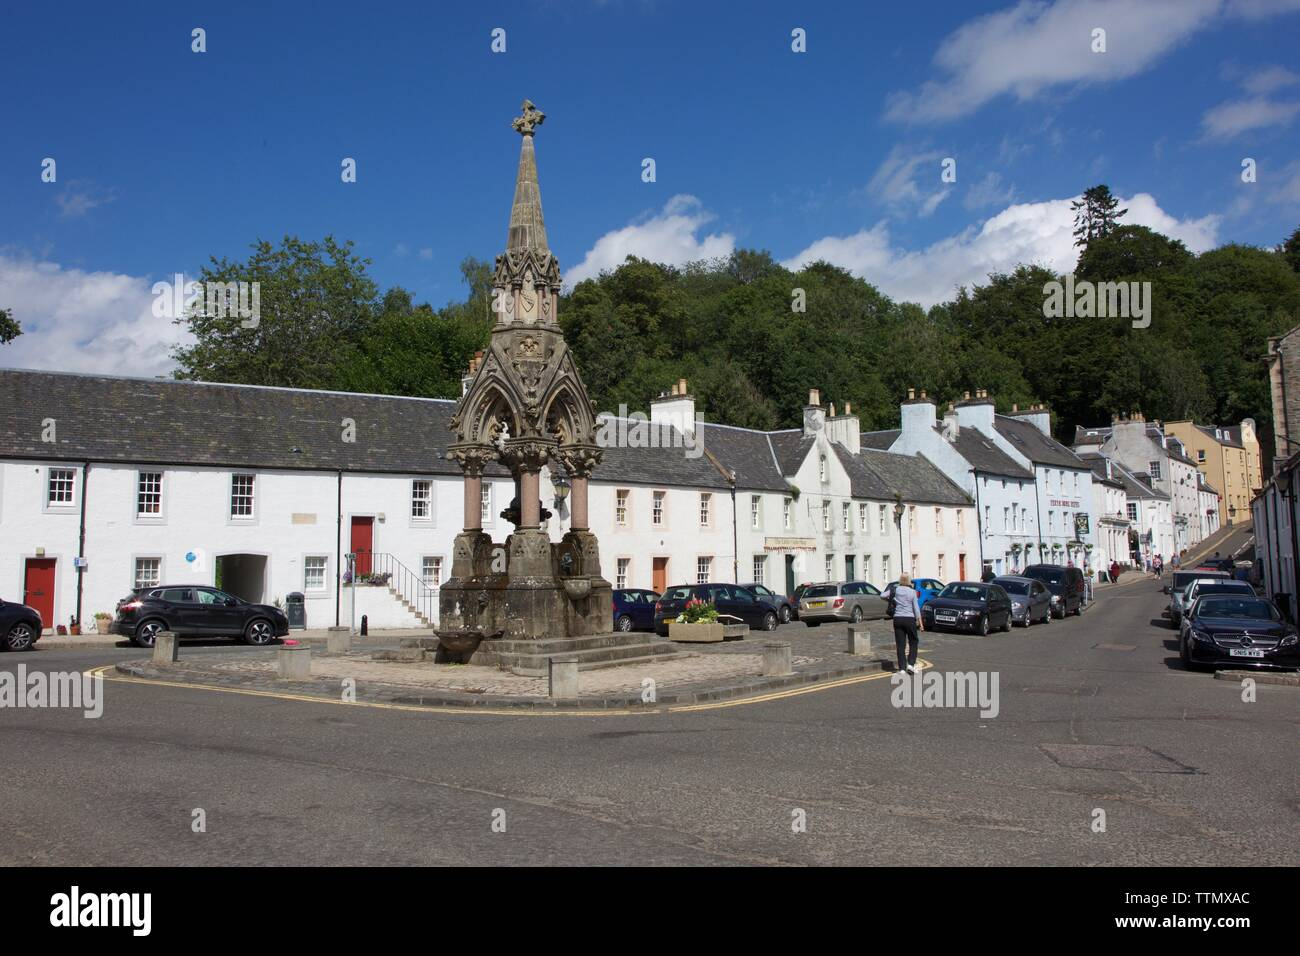 Dunkeld, Perthshire, UK, 9th July 2018: Dunkeld High Street. Credit: Terry Murden, Alamy - Stock Image